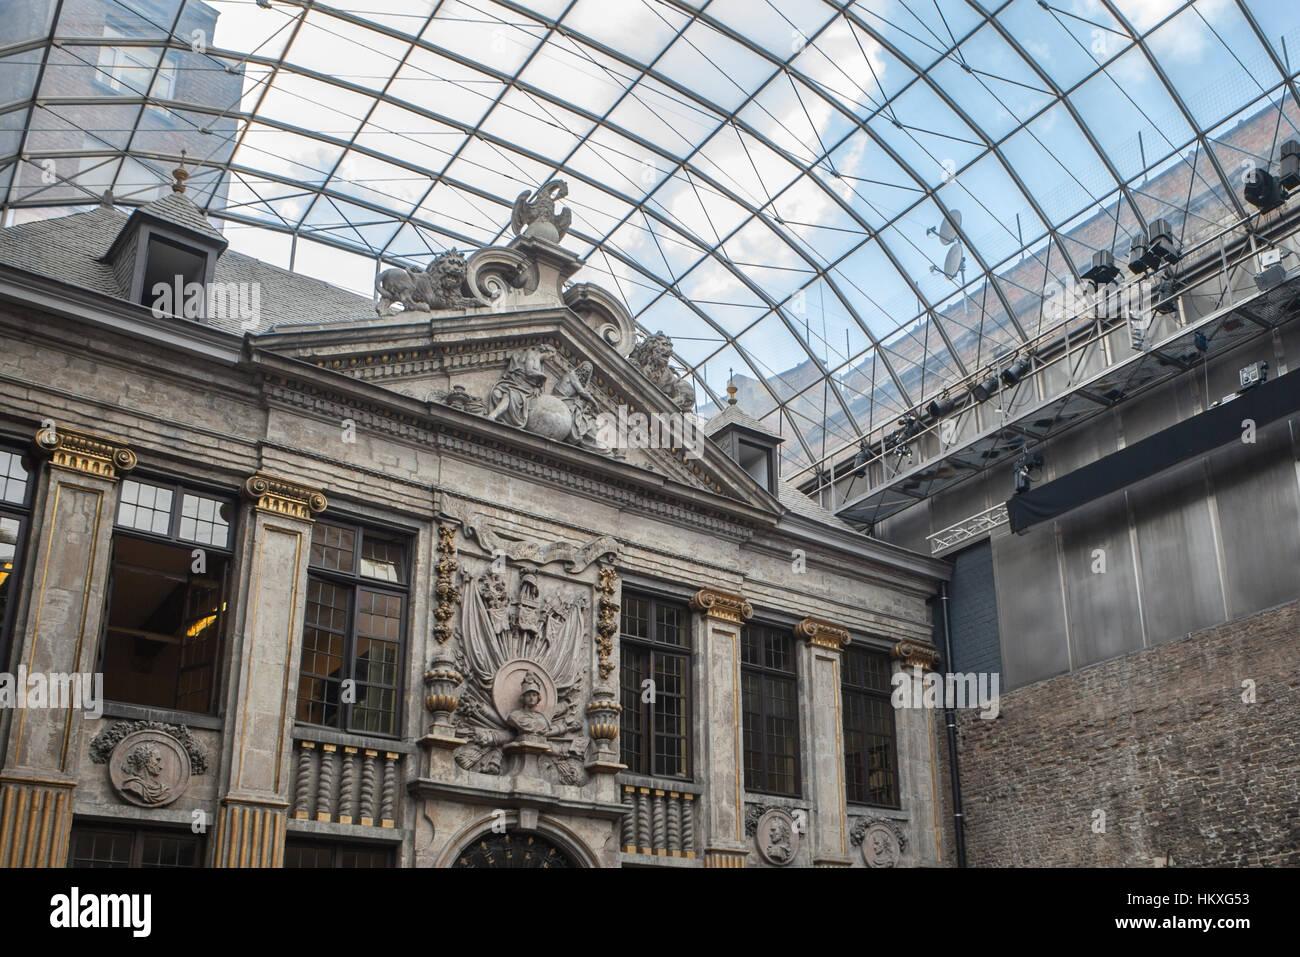 The Galeries Royales Saint-Hubert or Galerie de la Reine in Brussels. Belgium - Stock Image